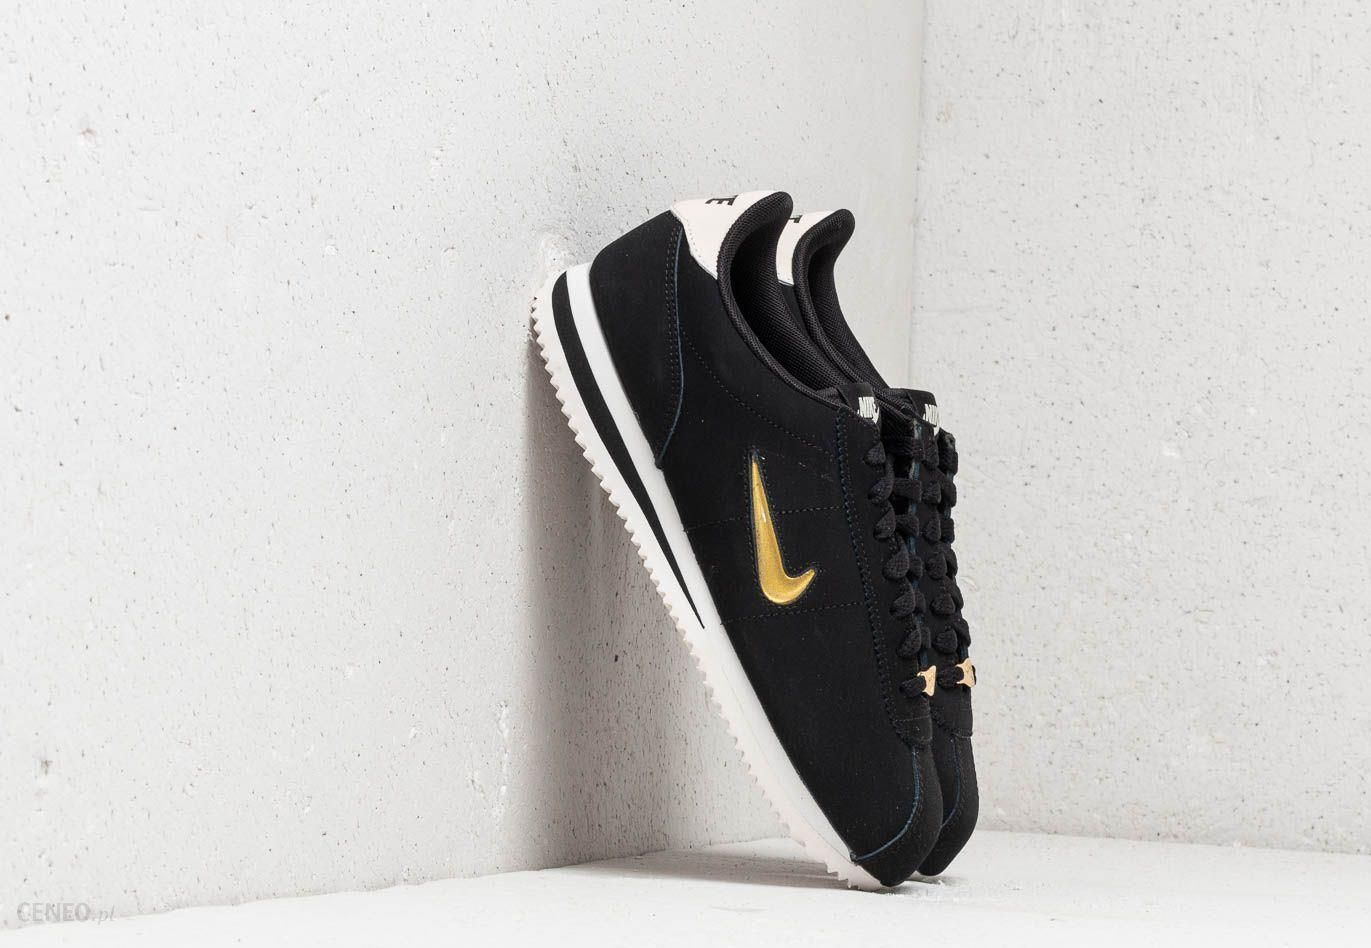 half off 1f250 9a3fe Nike Cortez Basic Jewel ´18 Wmns Black  Metallic Gold-Phantom - zdjęcie 1